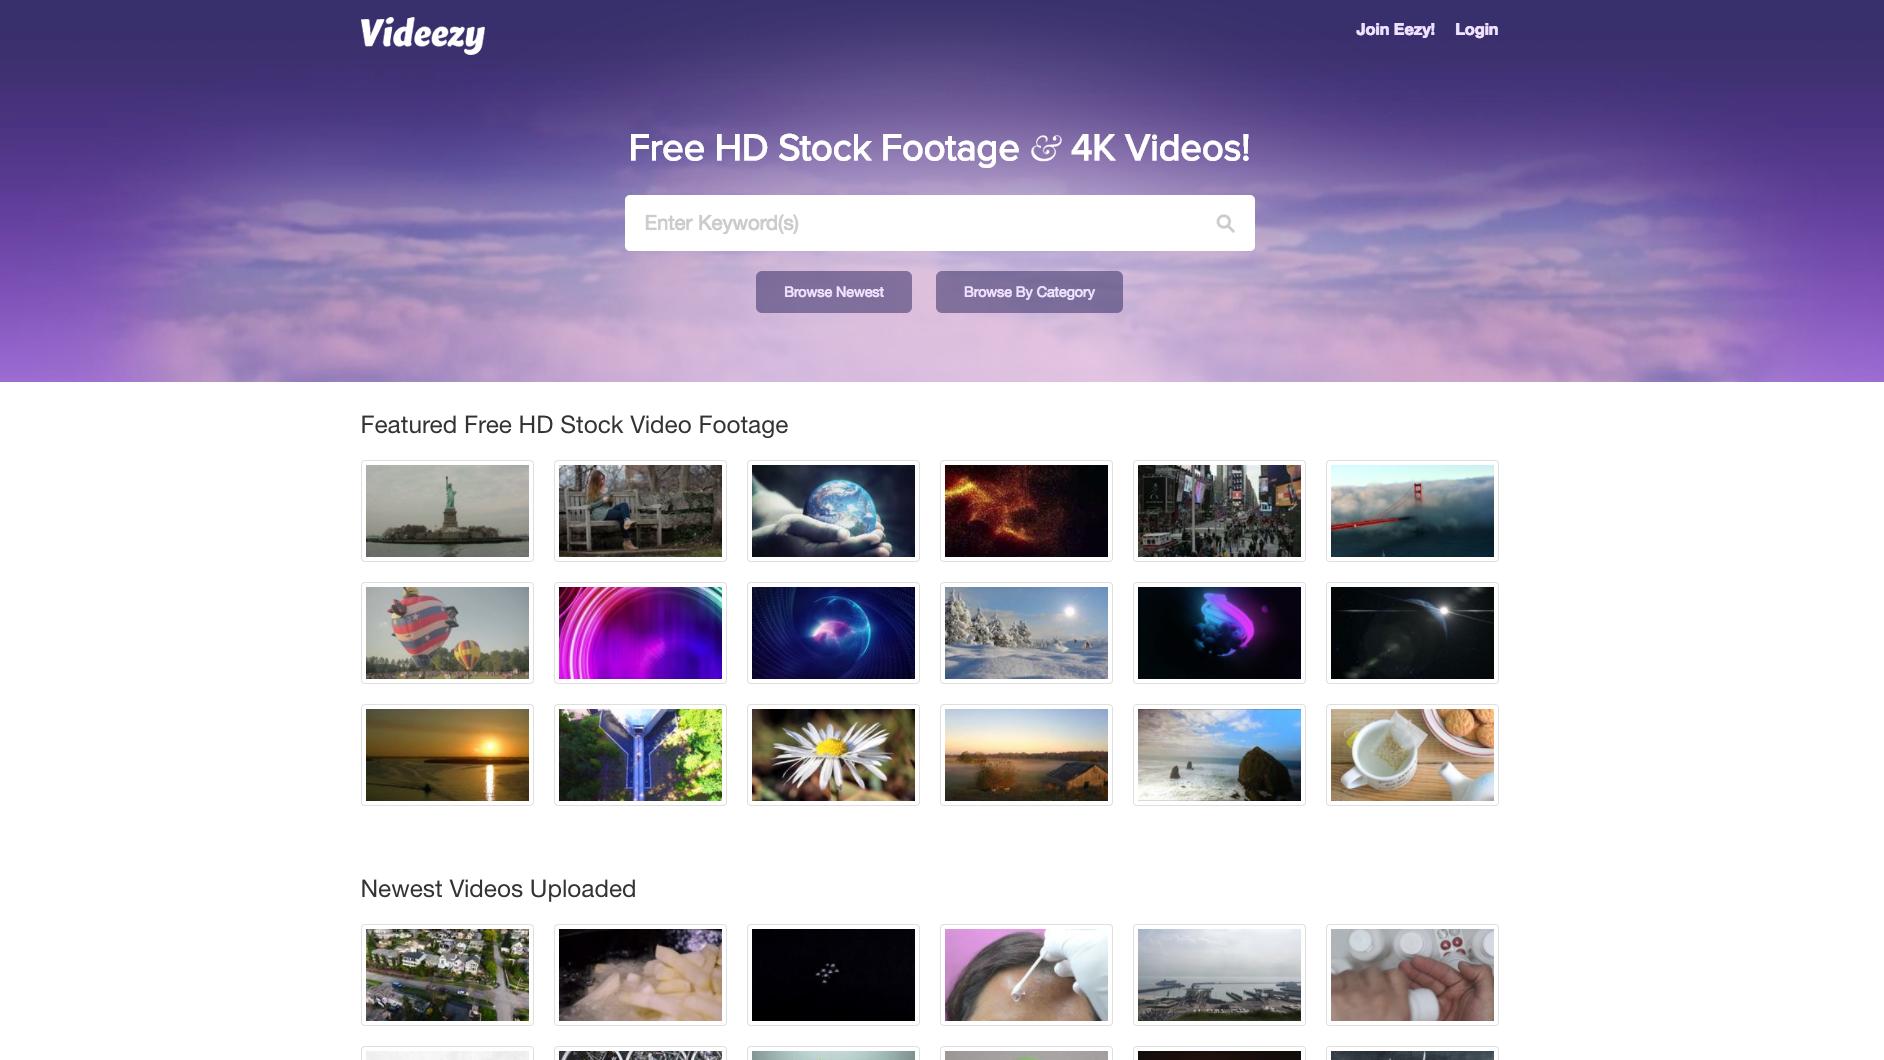 Videezy screen grab